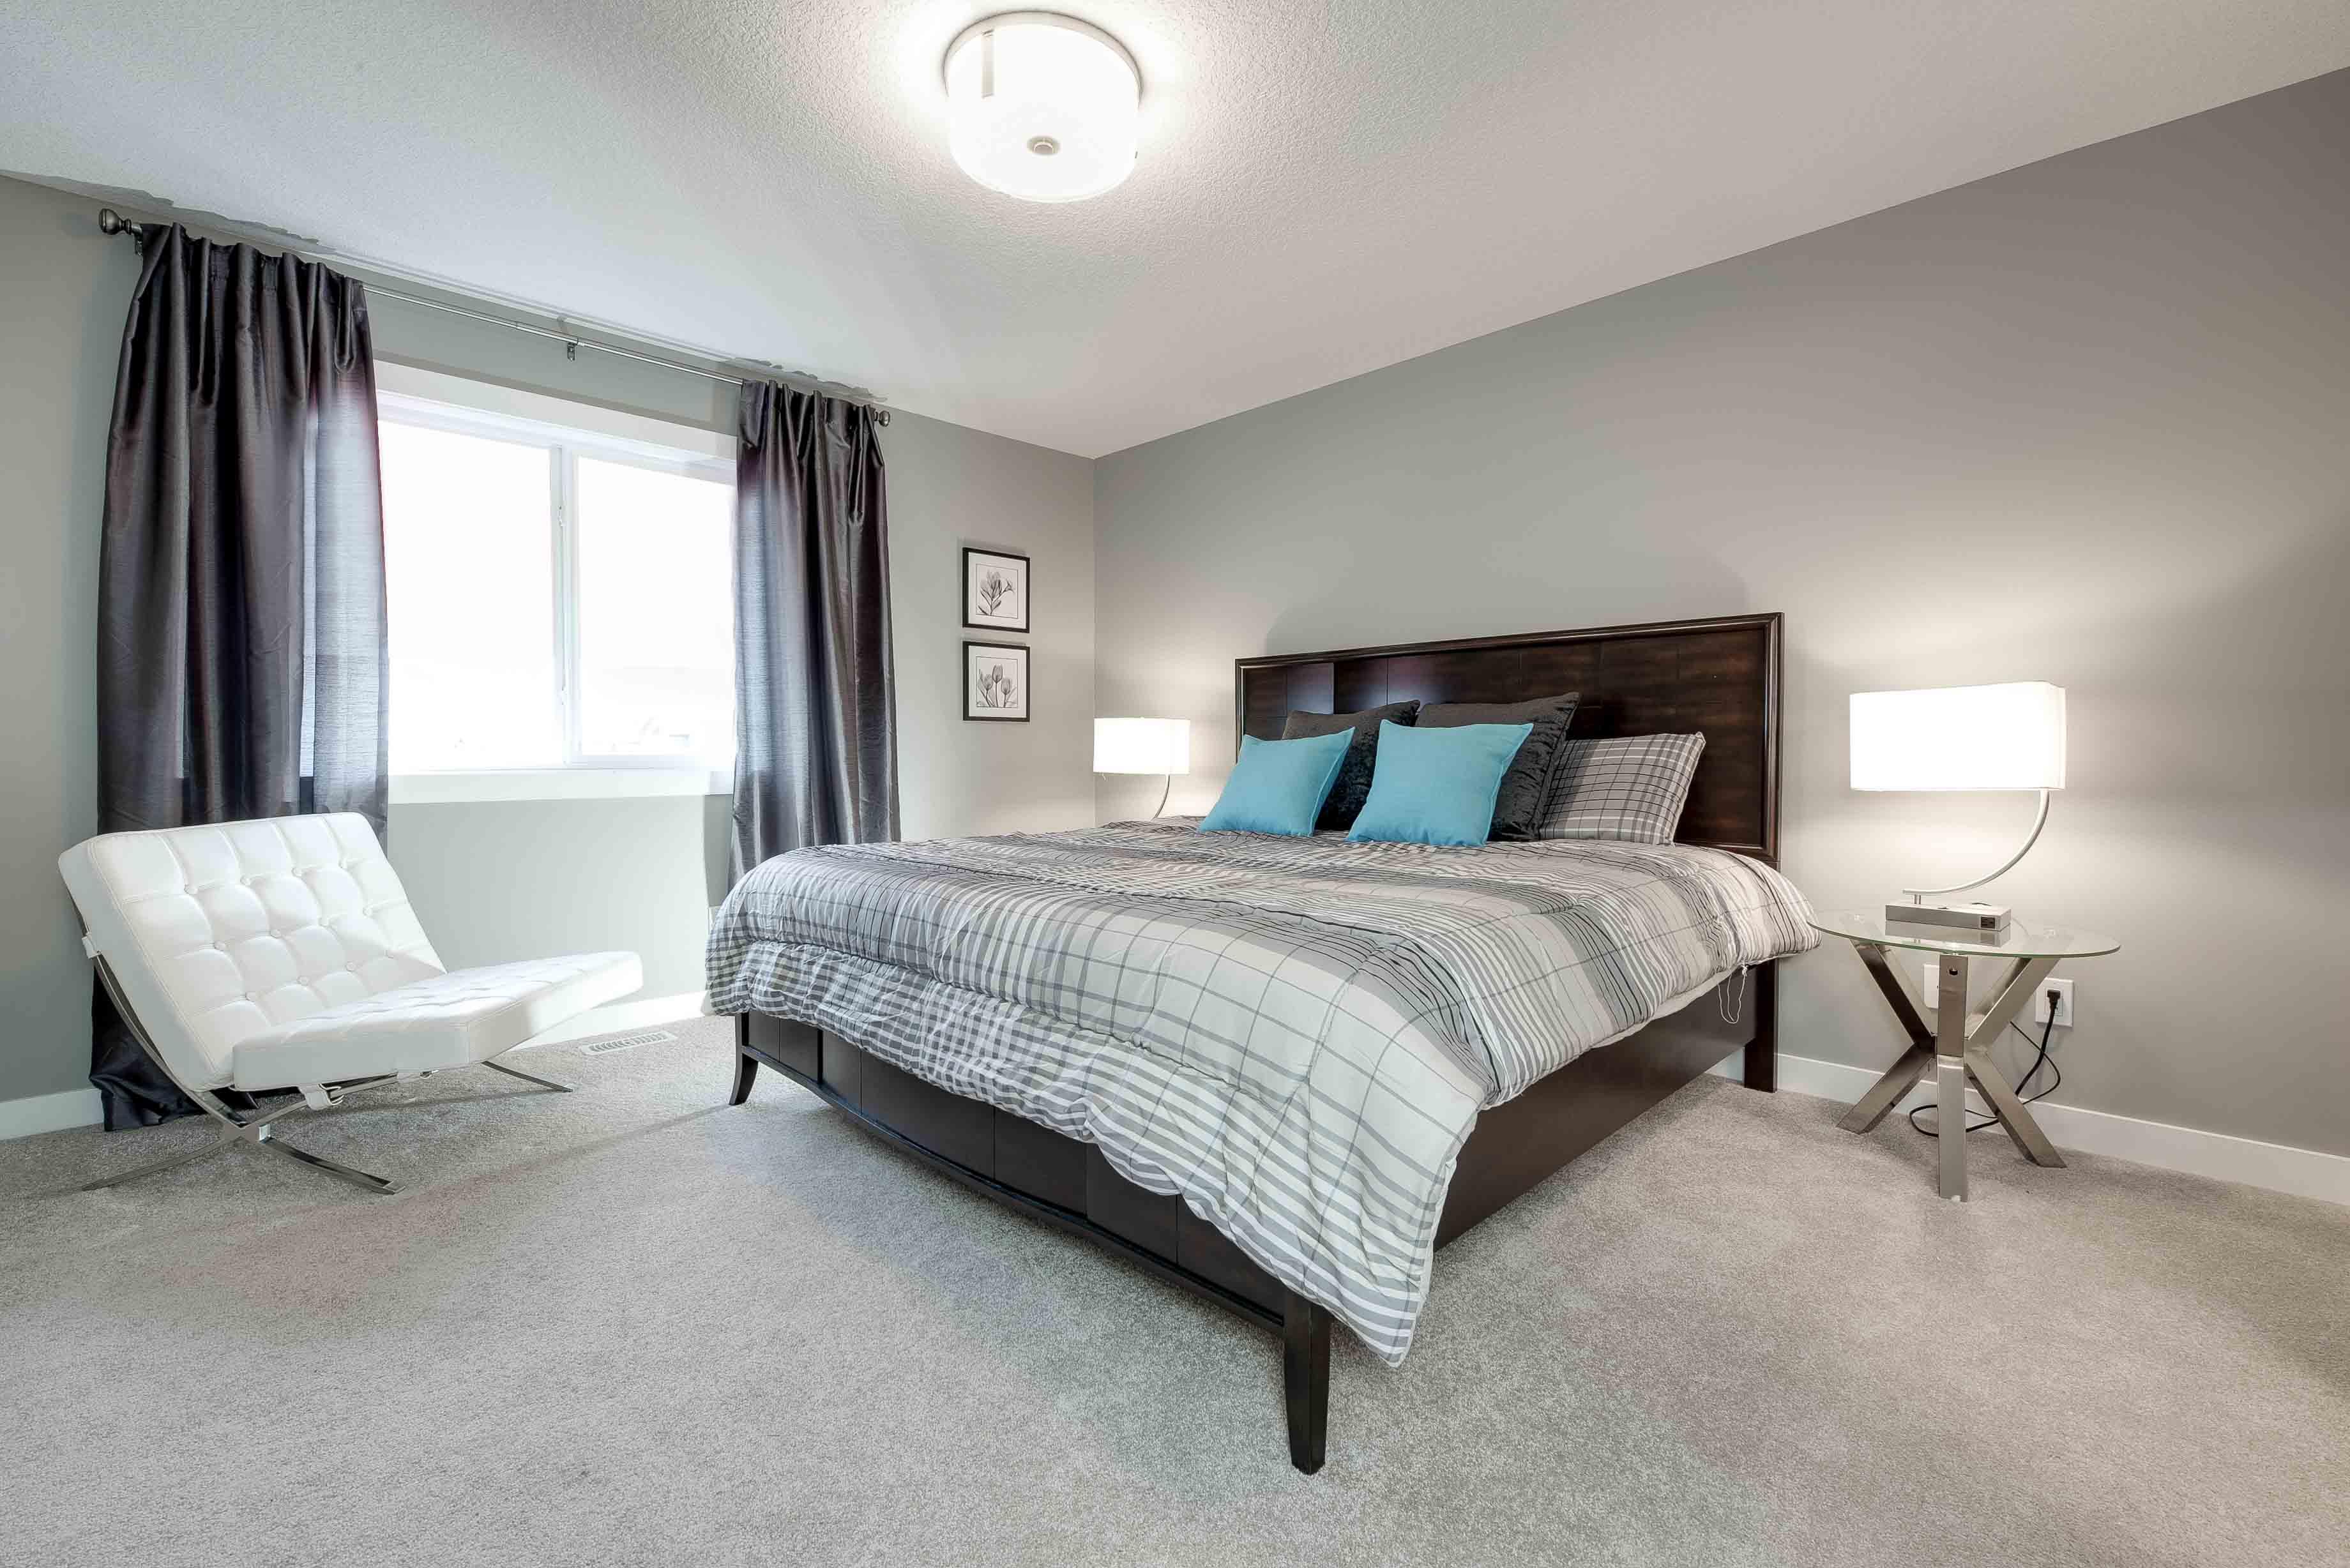 Glenora Homes Time Tested Quality - Custom home design edmonton